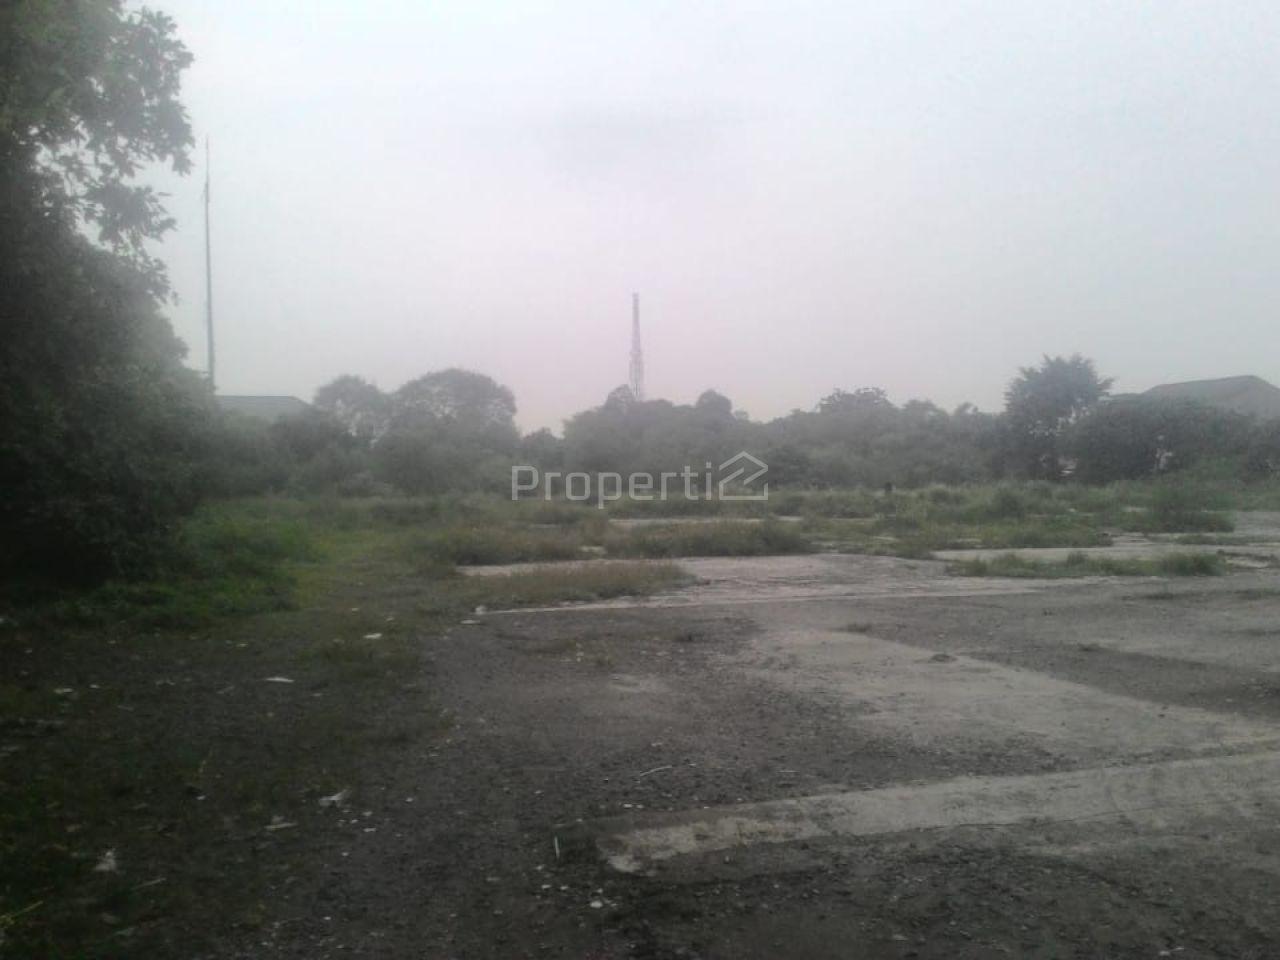 Flat Land 9.5 Ha in Cibubur, DKI Jakarta